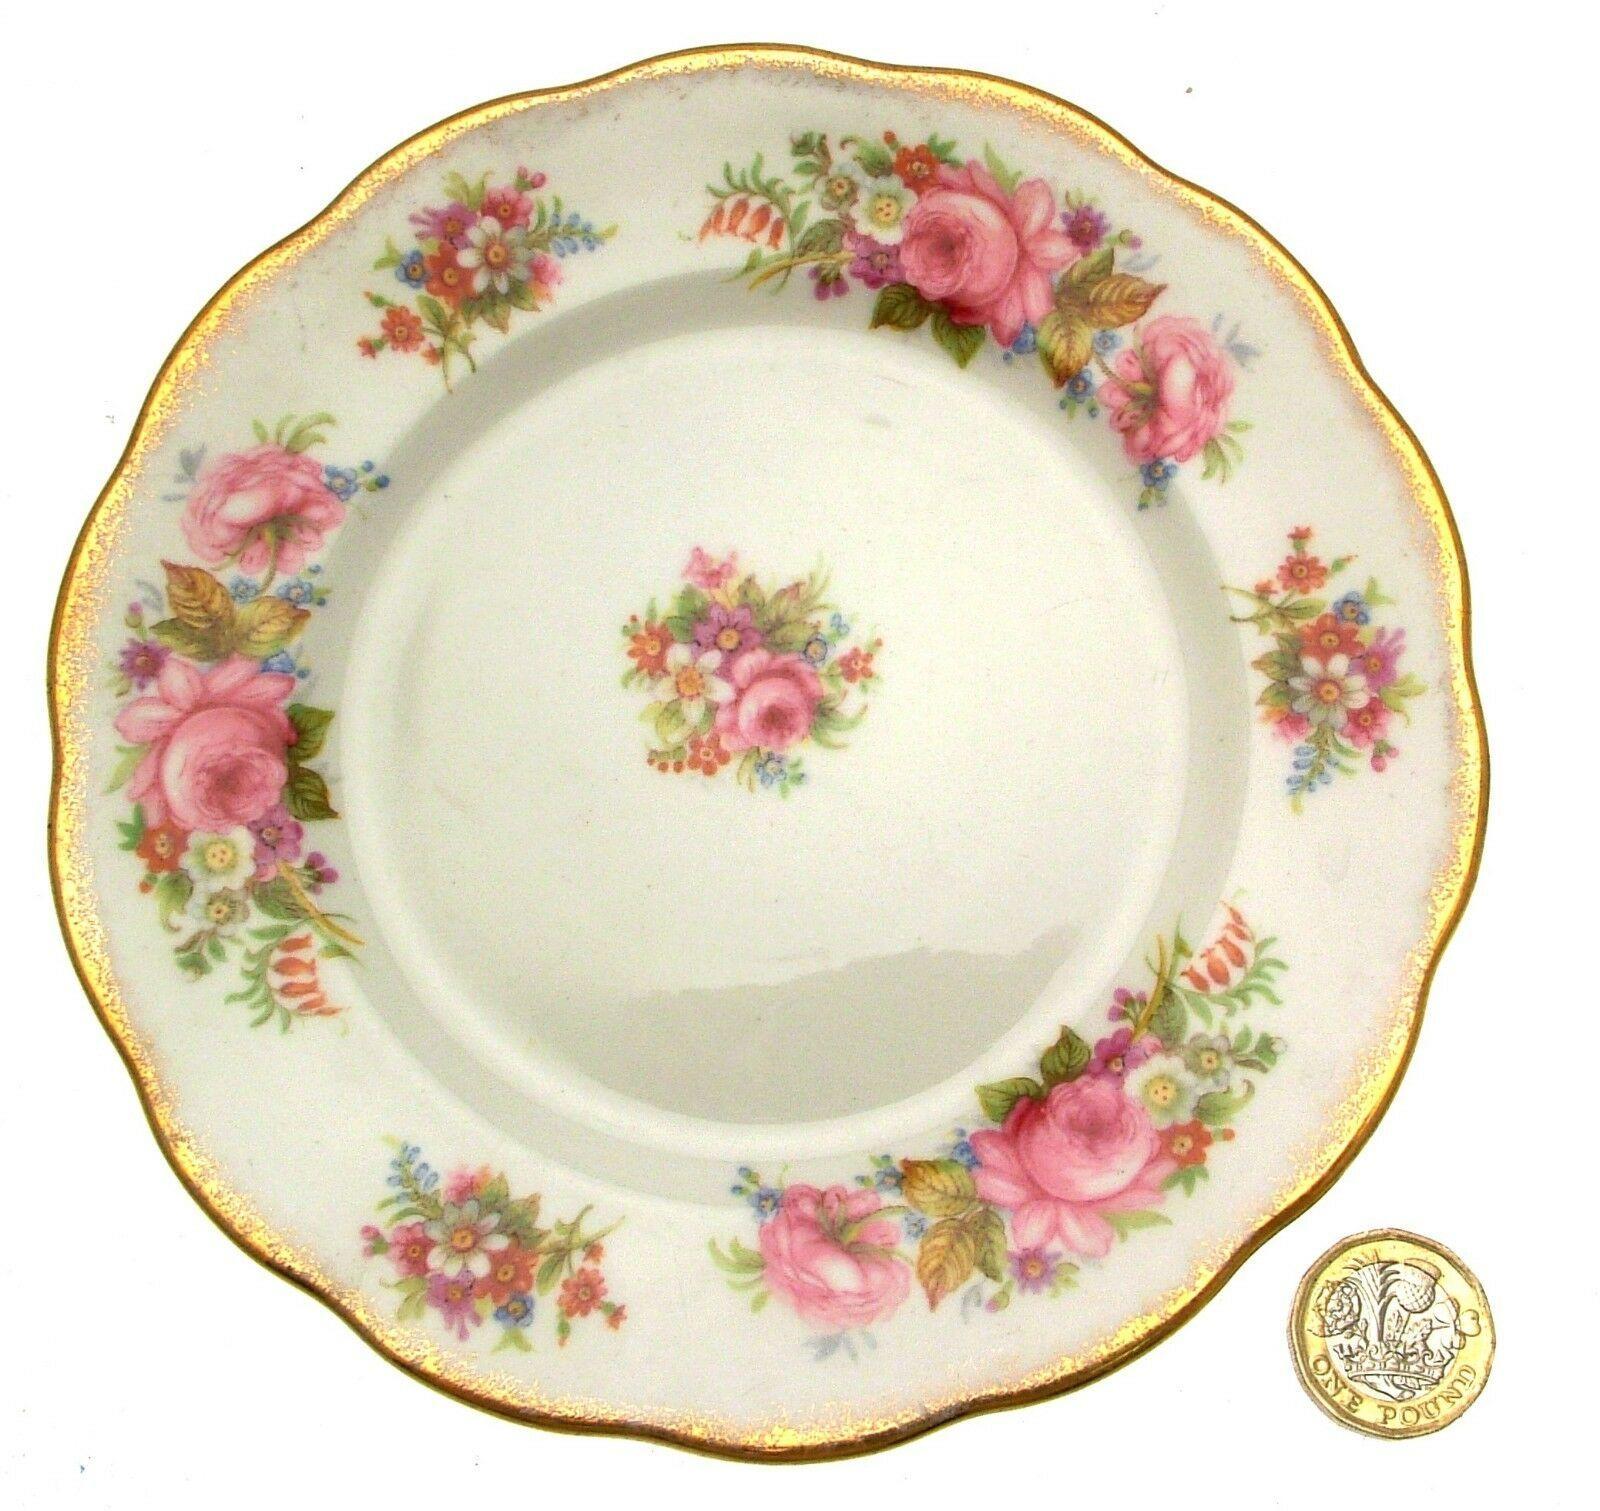 Royal Albert Chatsworth Plate 16 cms Roses Pattern